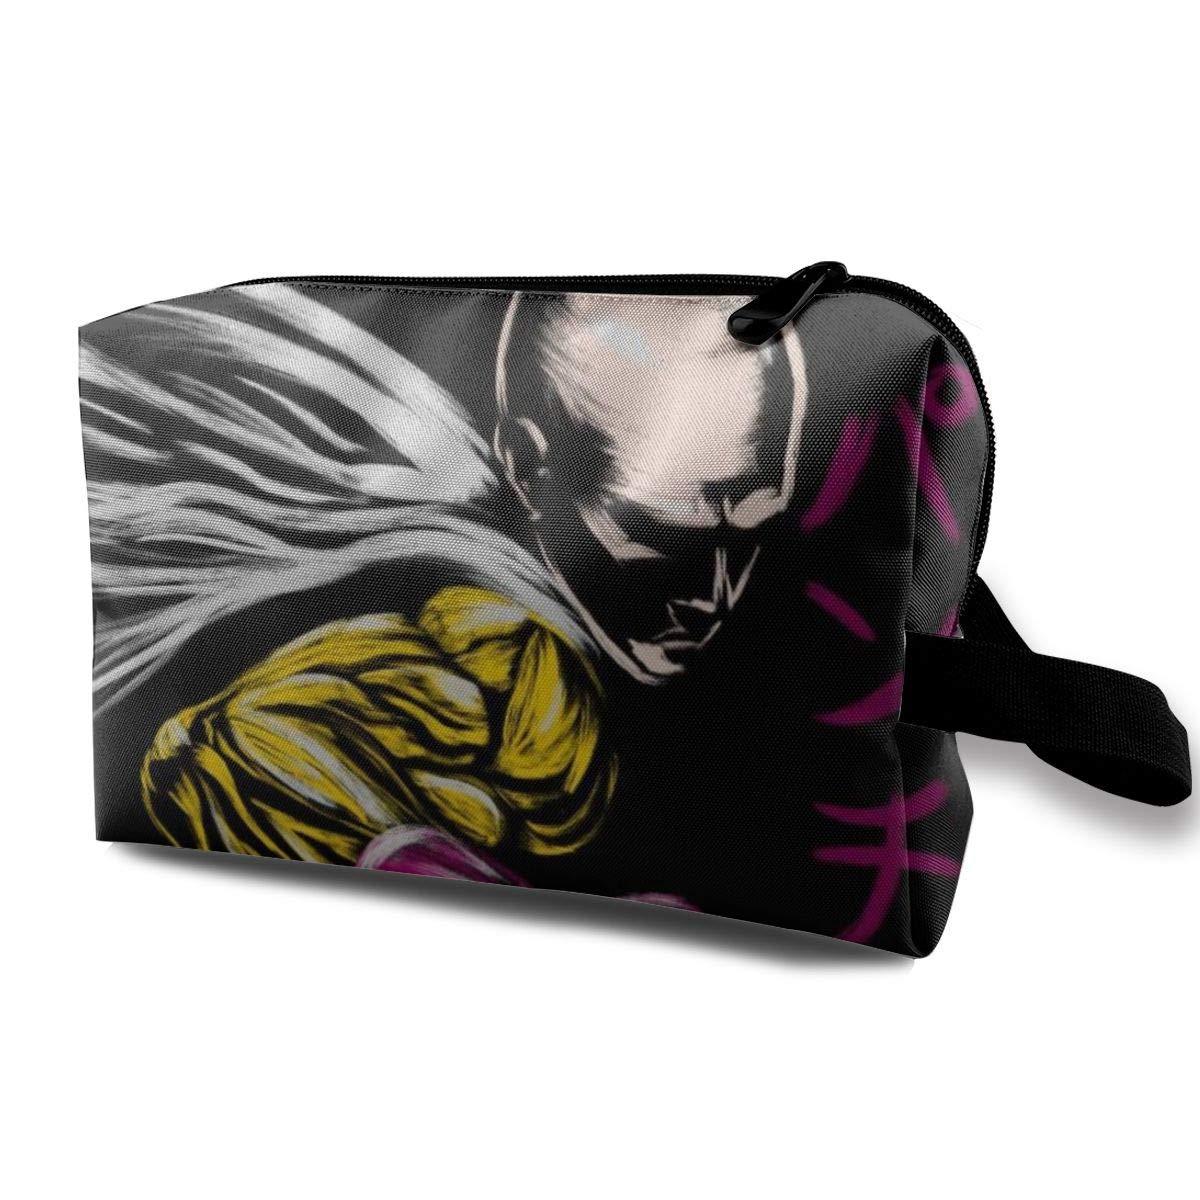 Makeup Bag Cosmetic Pouch One Punch Man Wanpanman Saitama Multi-Functional Bag Travel Kit